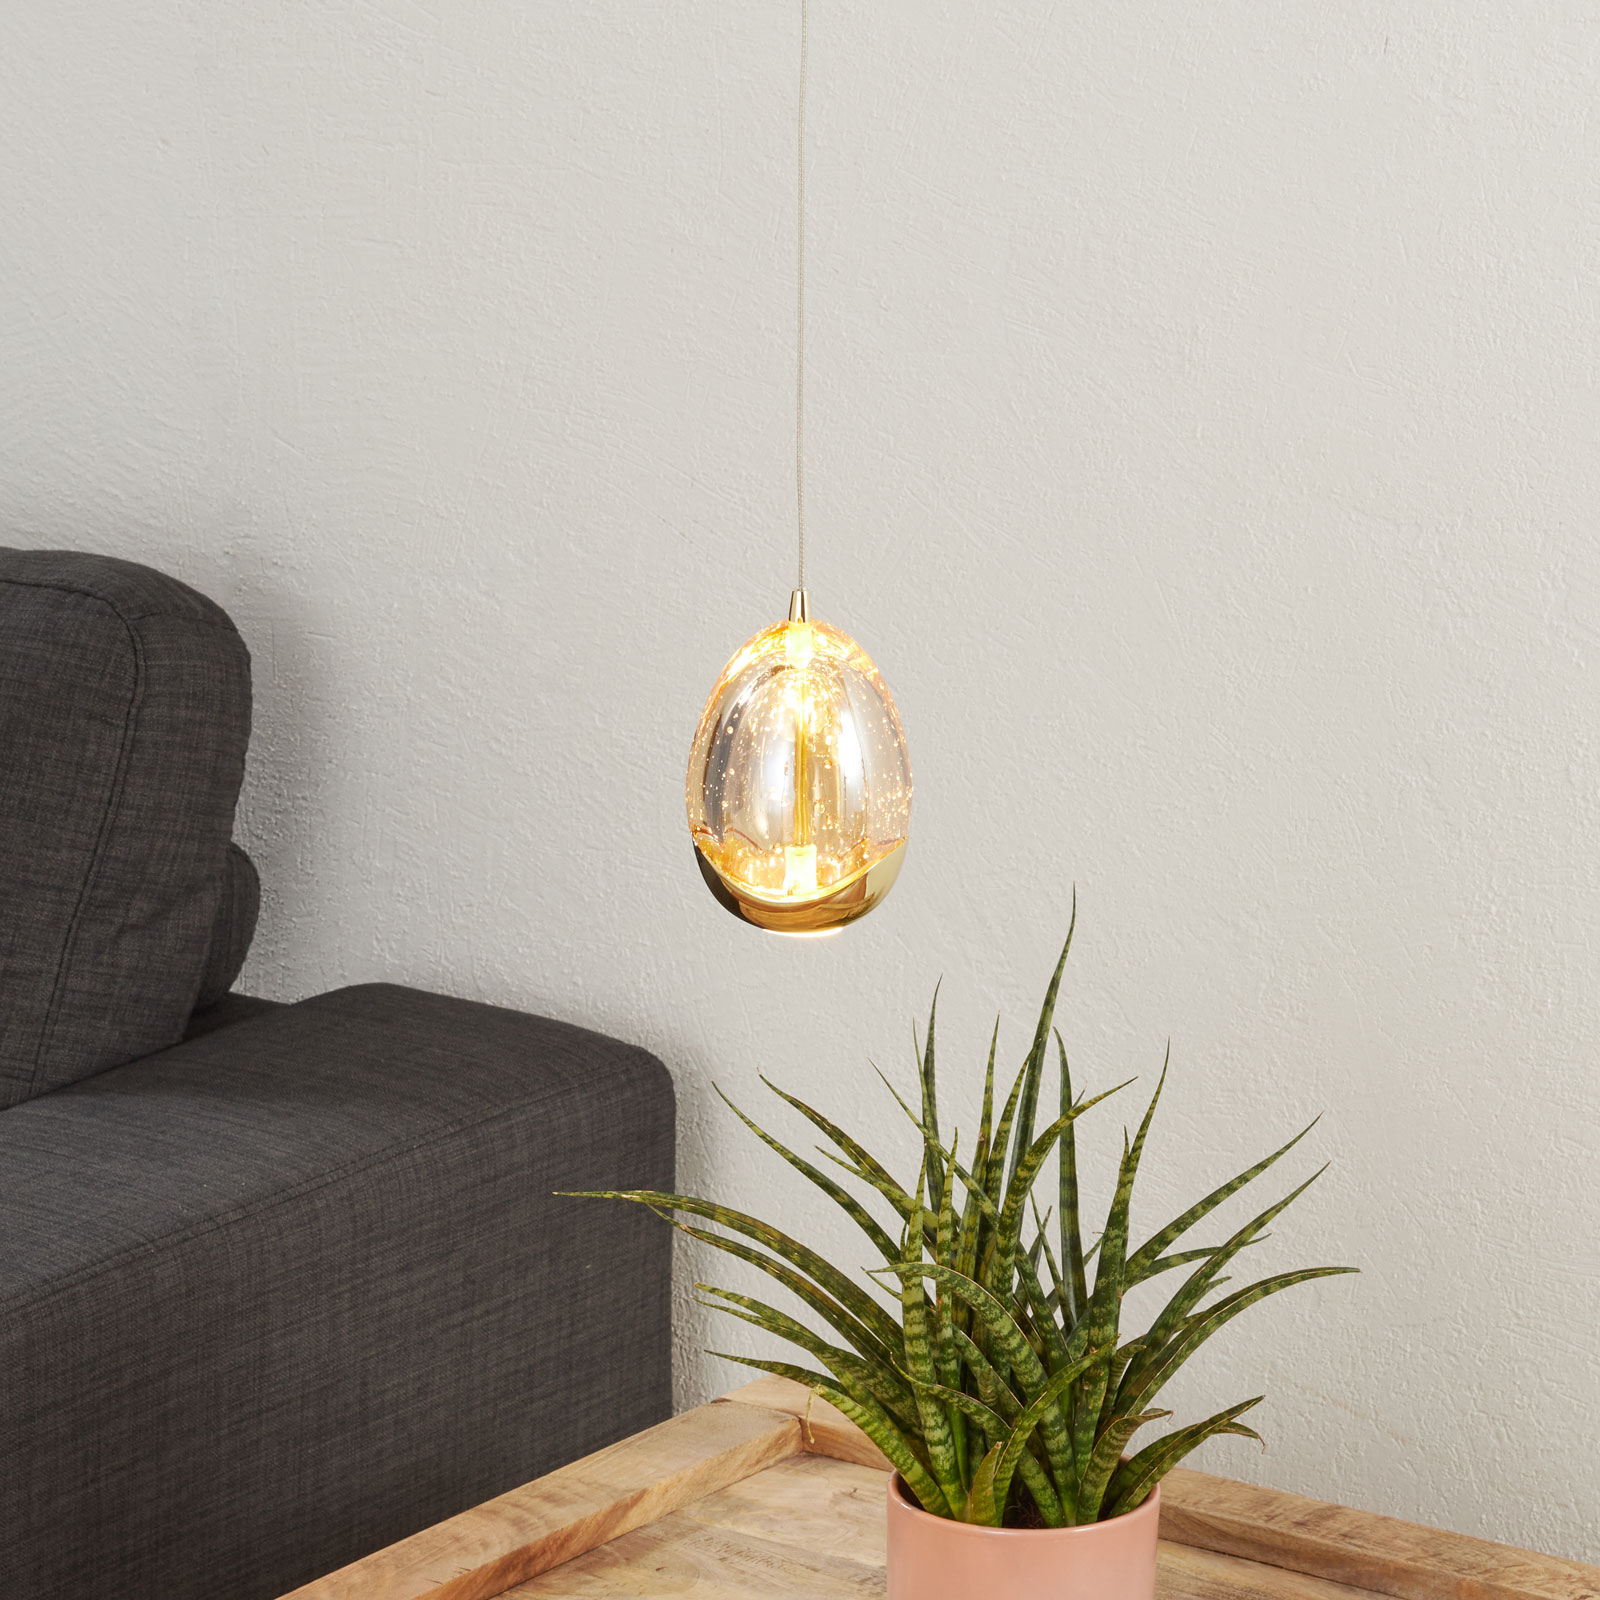 LED Pendelleuchte Rocio 1 flammig mit Gold Finish